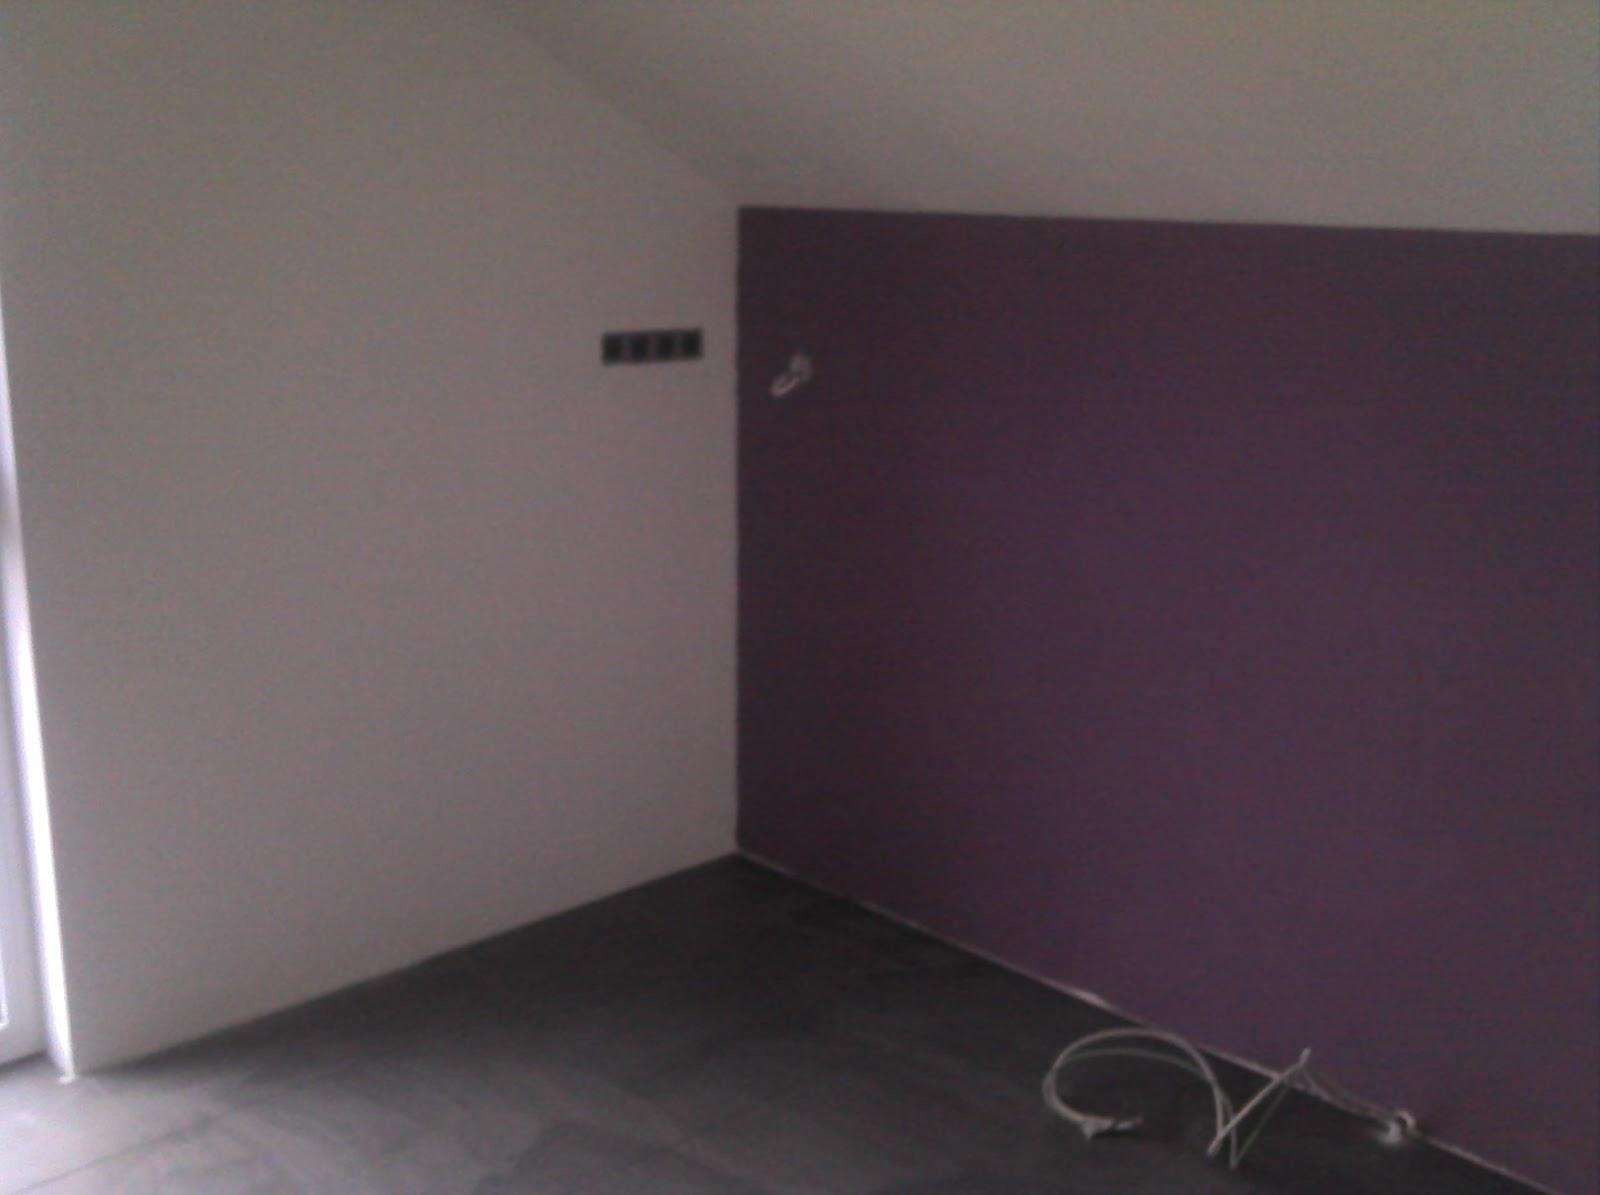 Hausbau   das tor zur hölle ; ): juni 2012